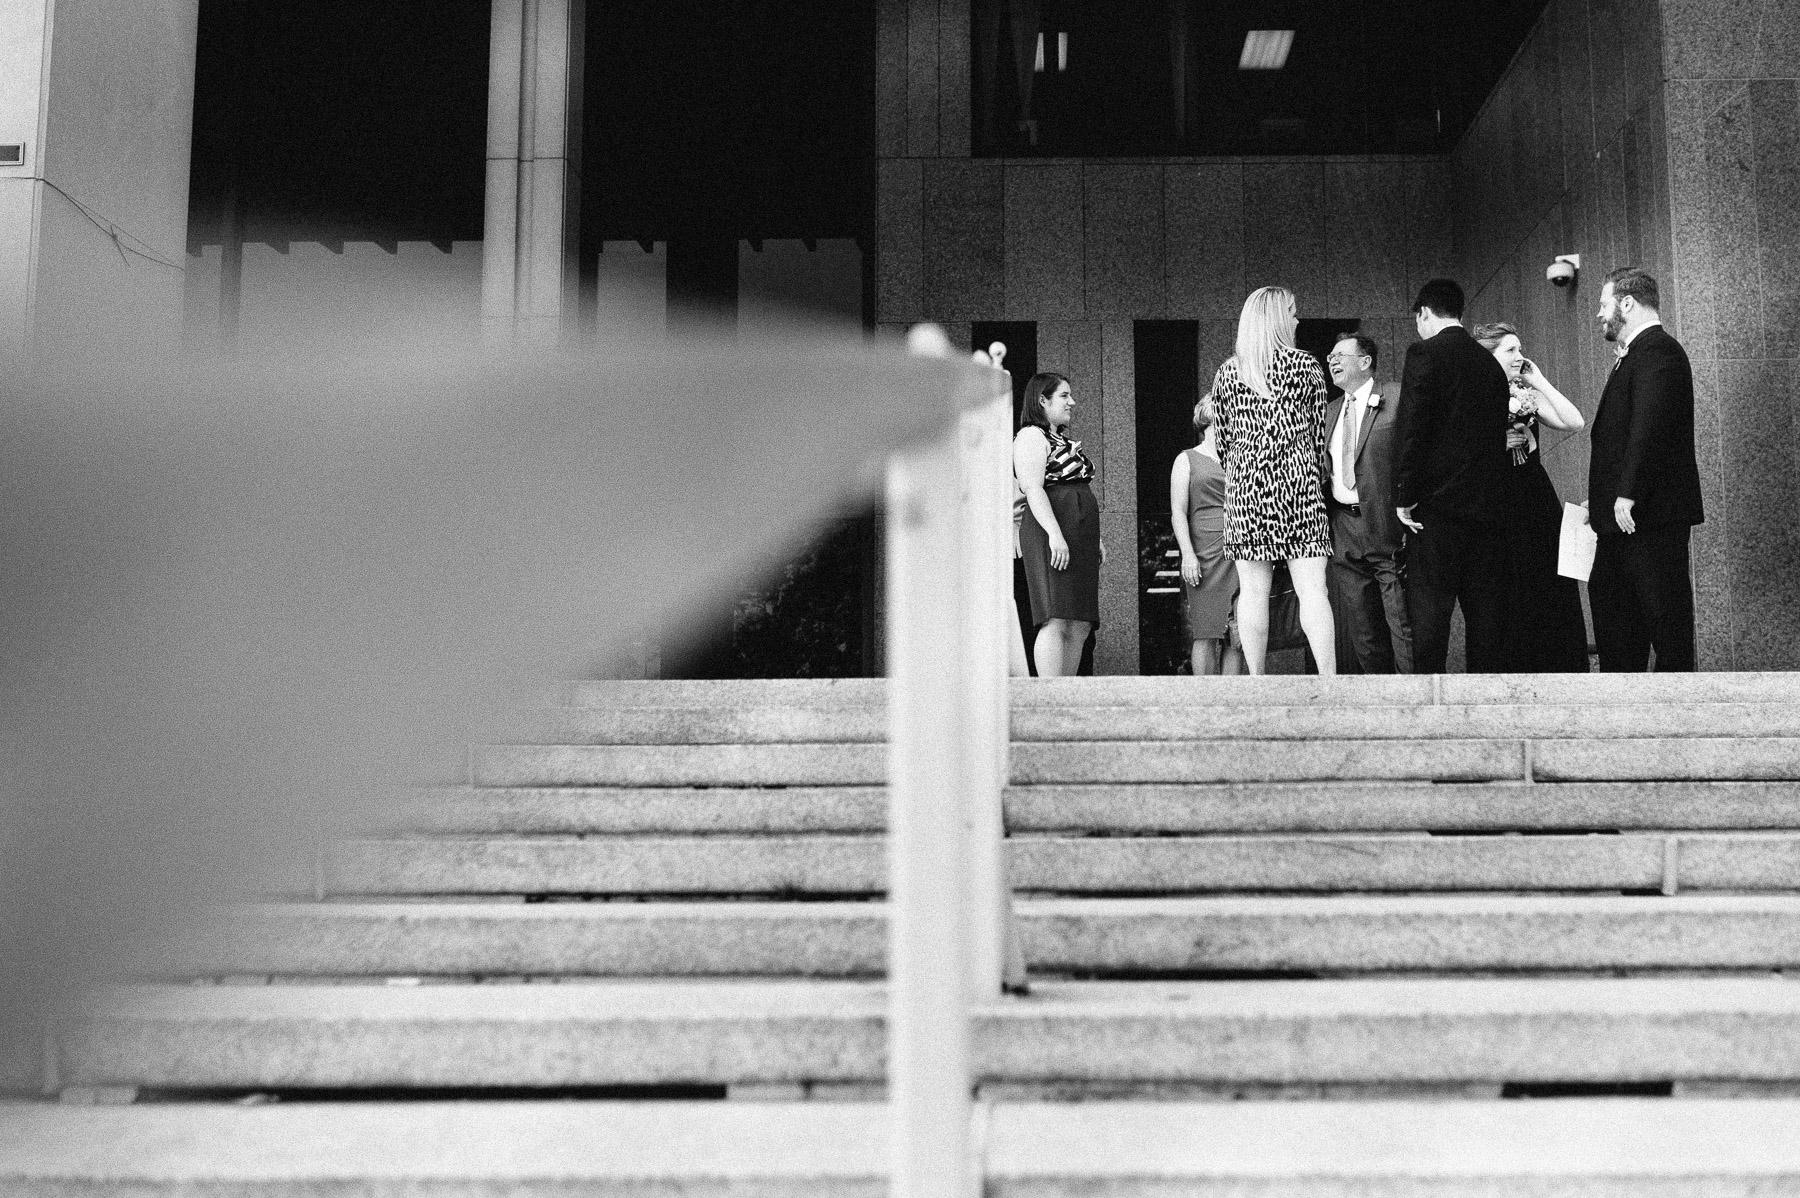 baltimore-courthouse-wedding-3.jpg